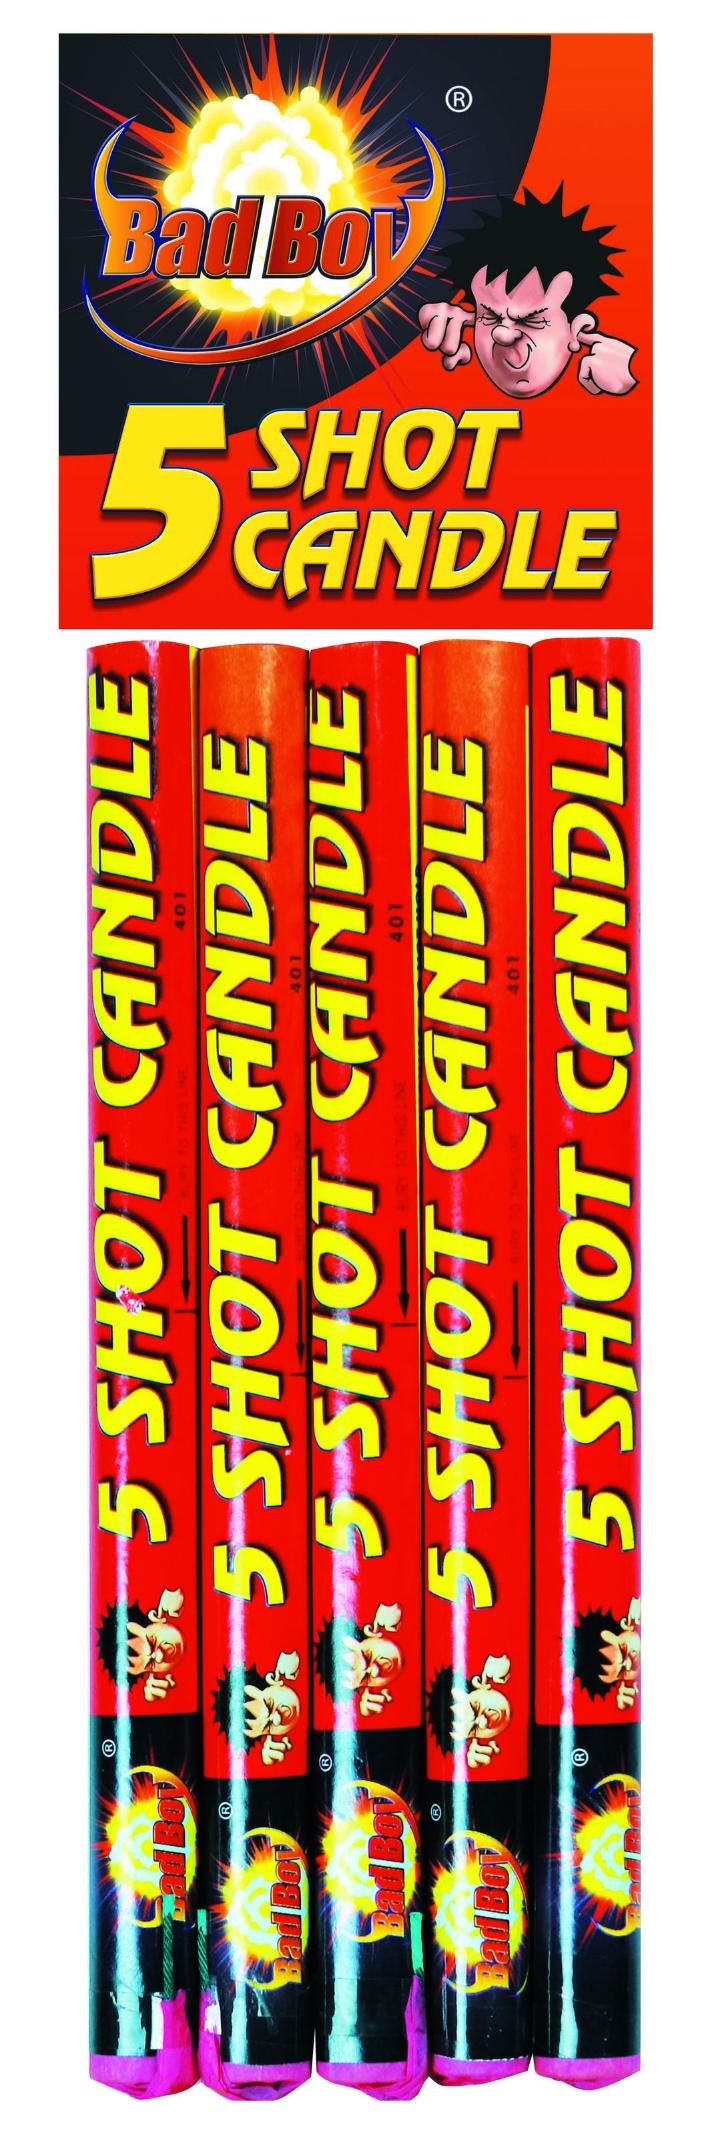 5 Shot Candle 5pk - RRP £5.99